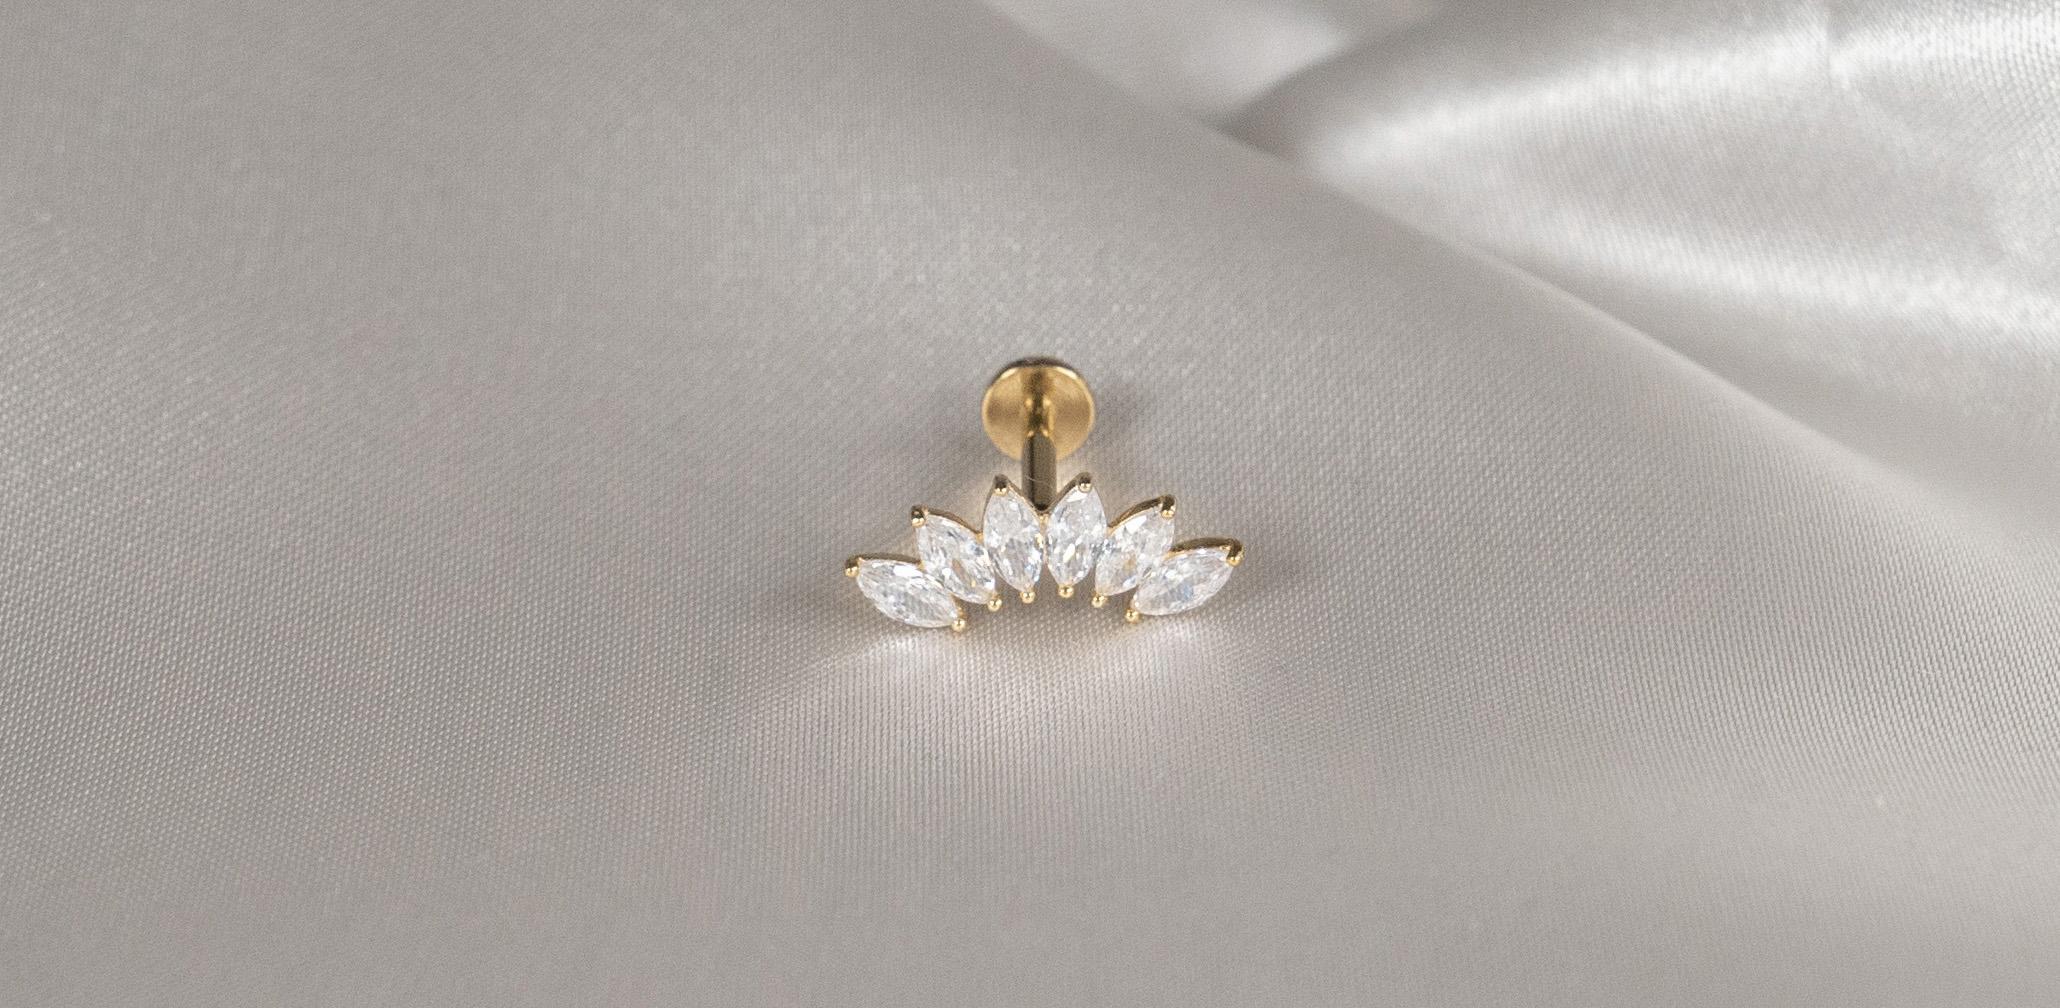 14k Solid Gold 6 Gem Tiara - Bella Andrea Piercing Jewellery (1)